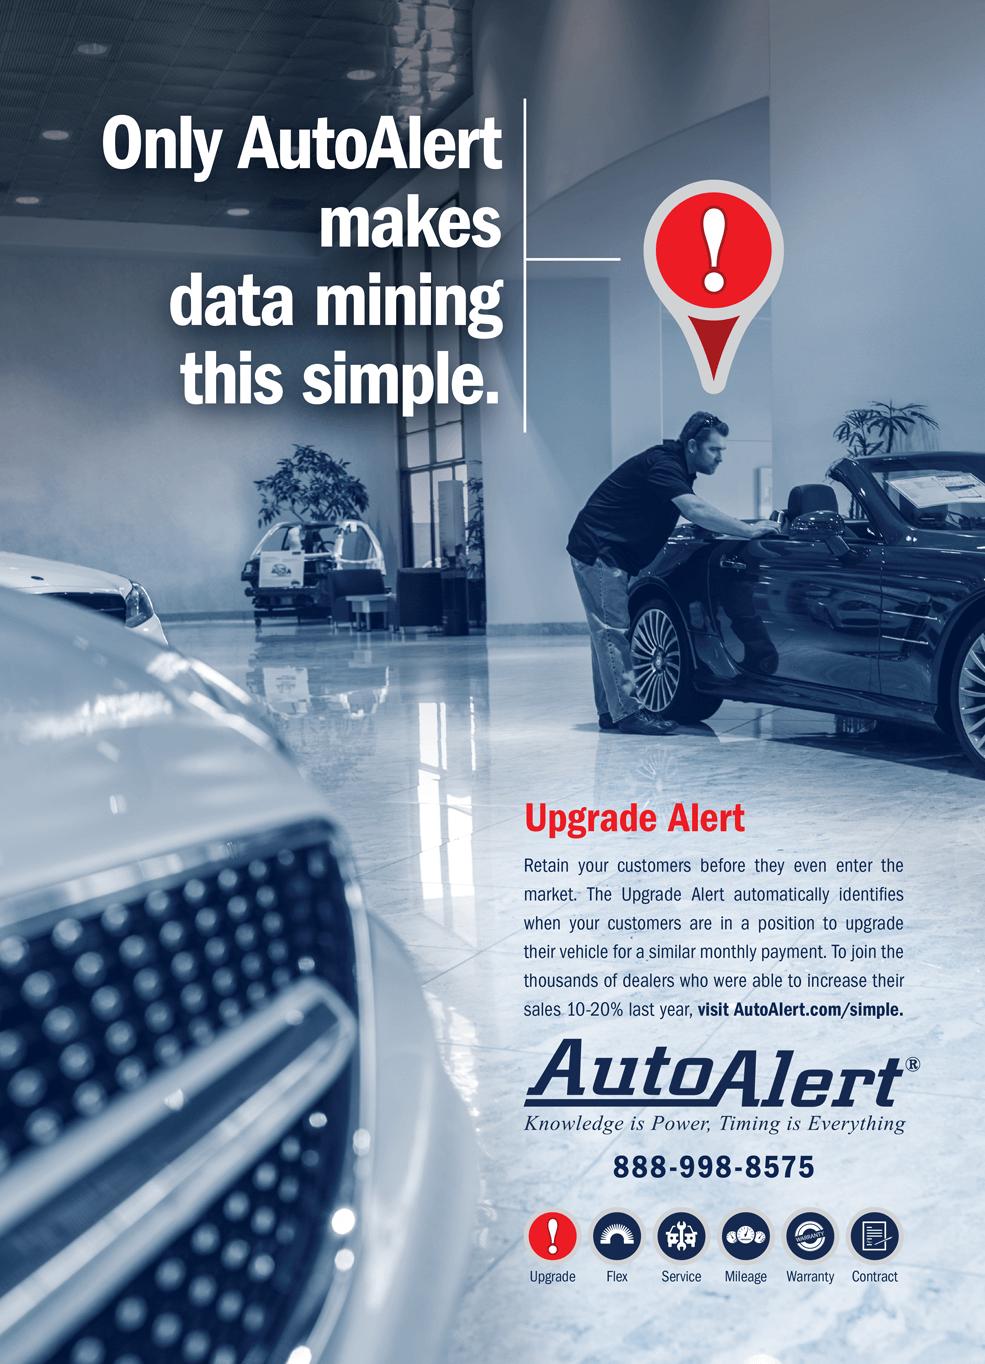 Auto Alert - Data Mining Magazine Ad